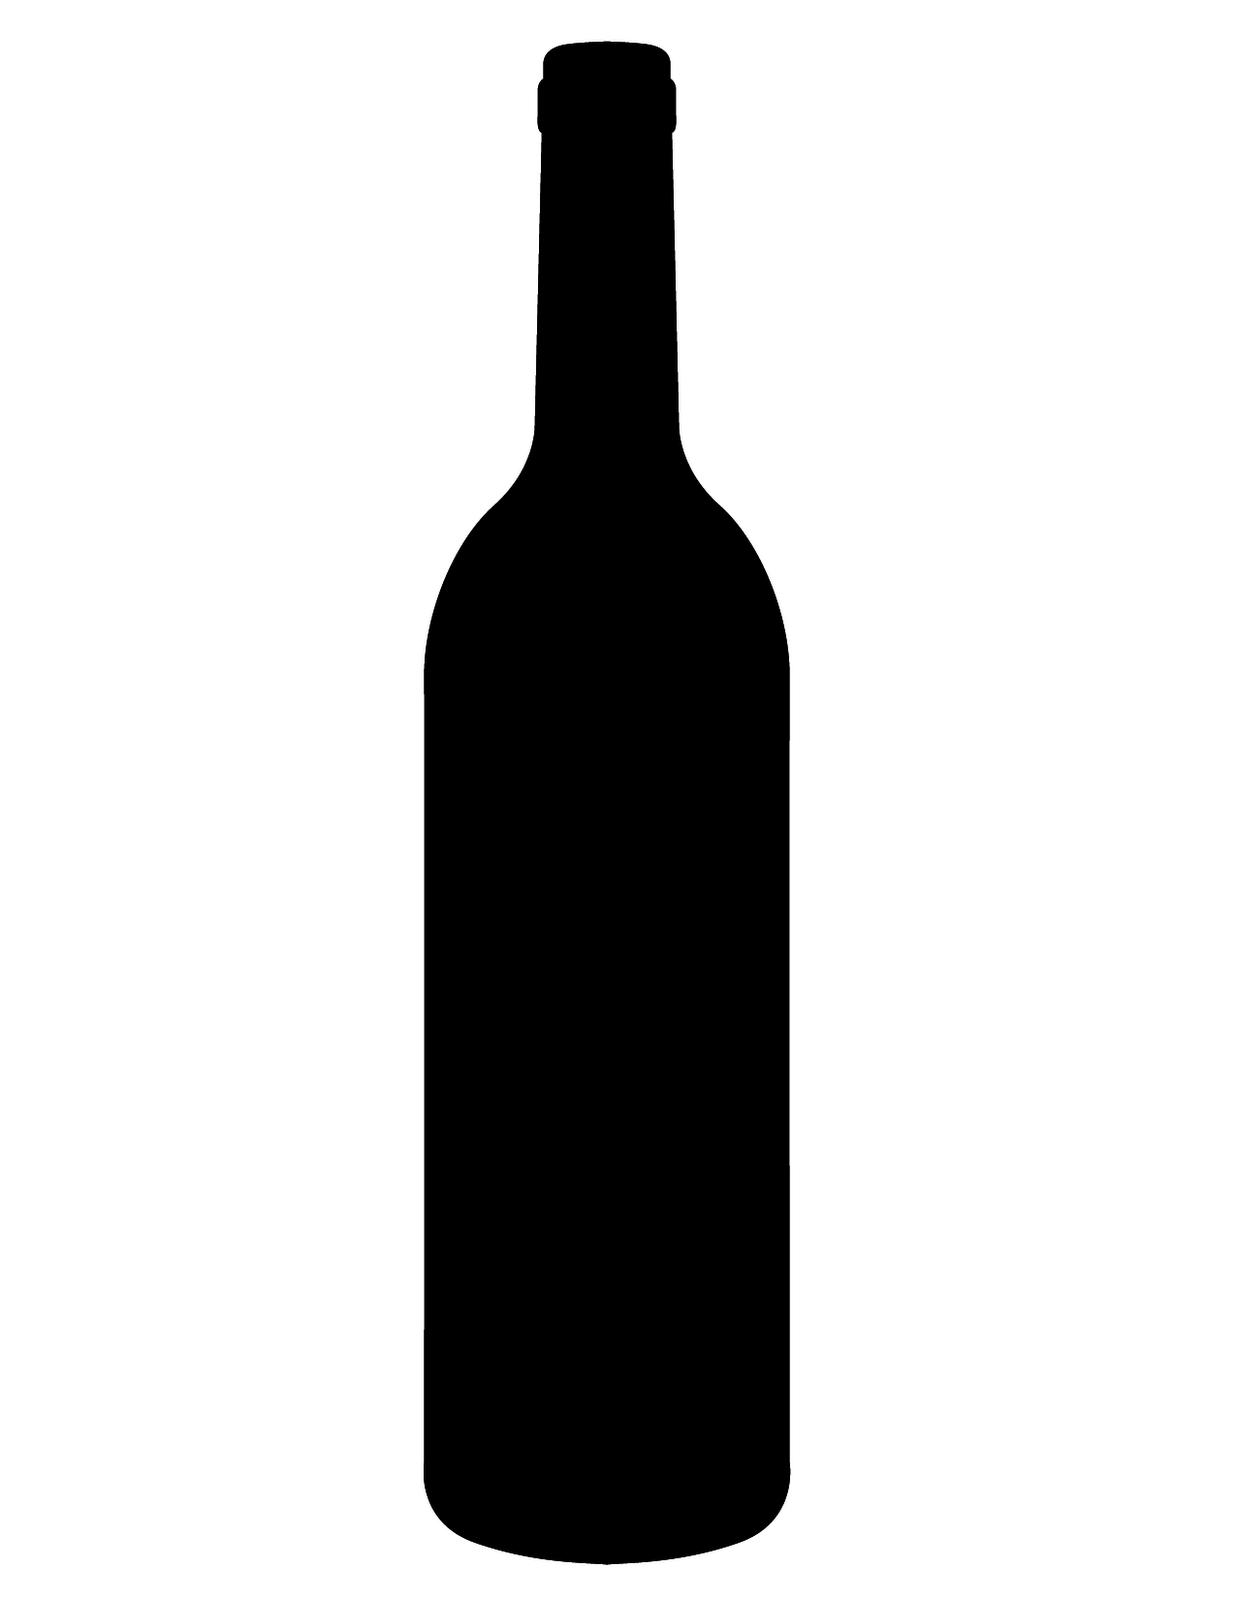 $25 Bottle (Mendham Twp Library)